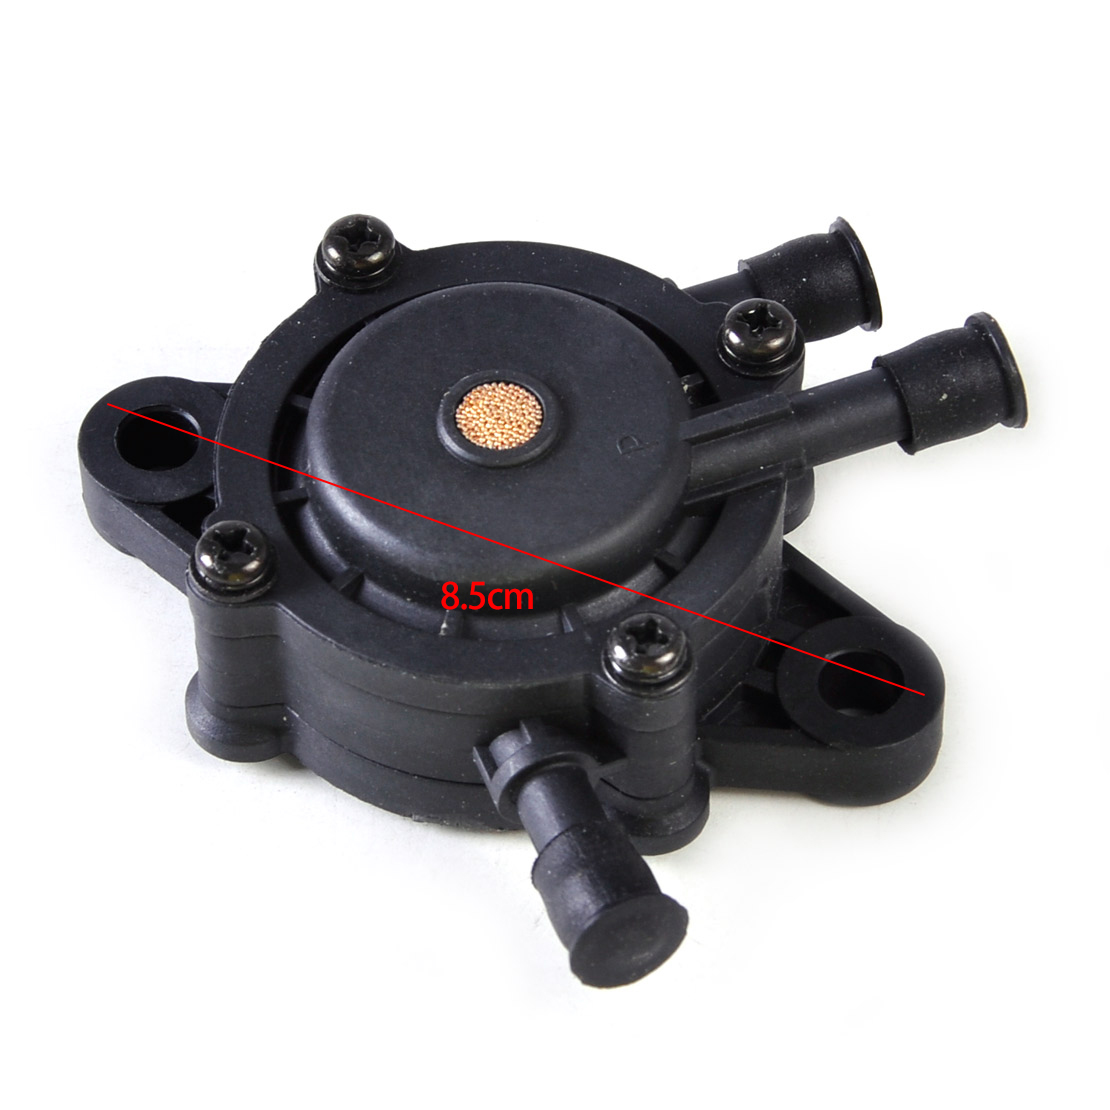 Fuel Pump Briggs Pulse for Honda GX200 160 Clone Engine